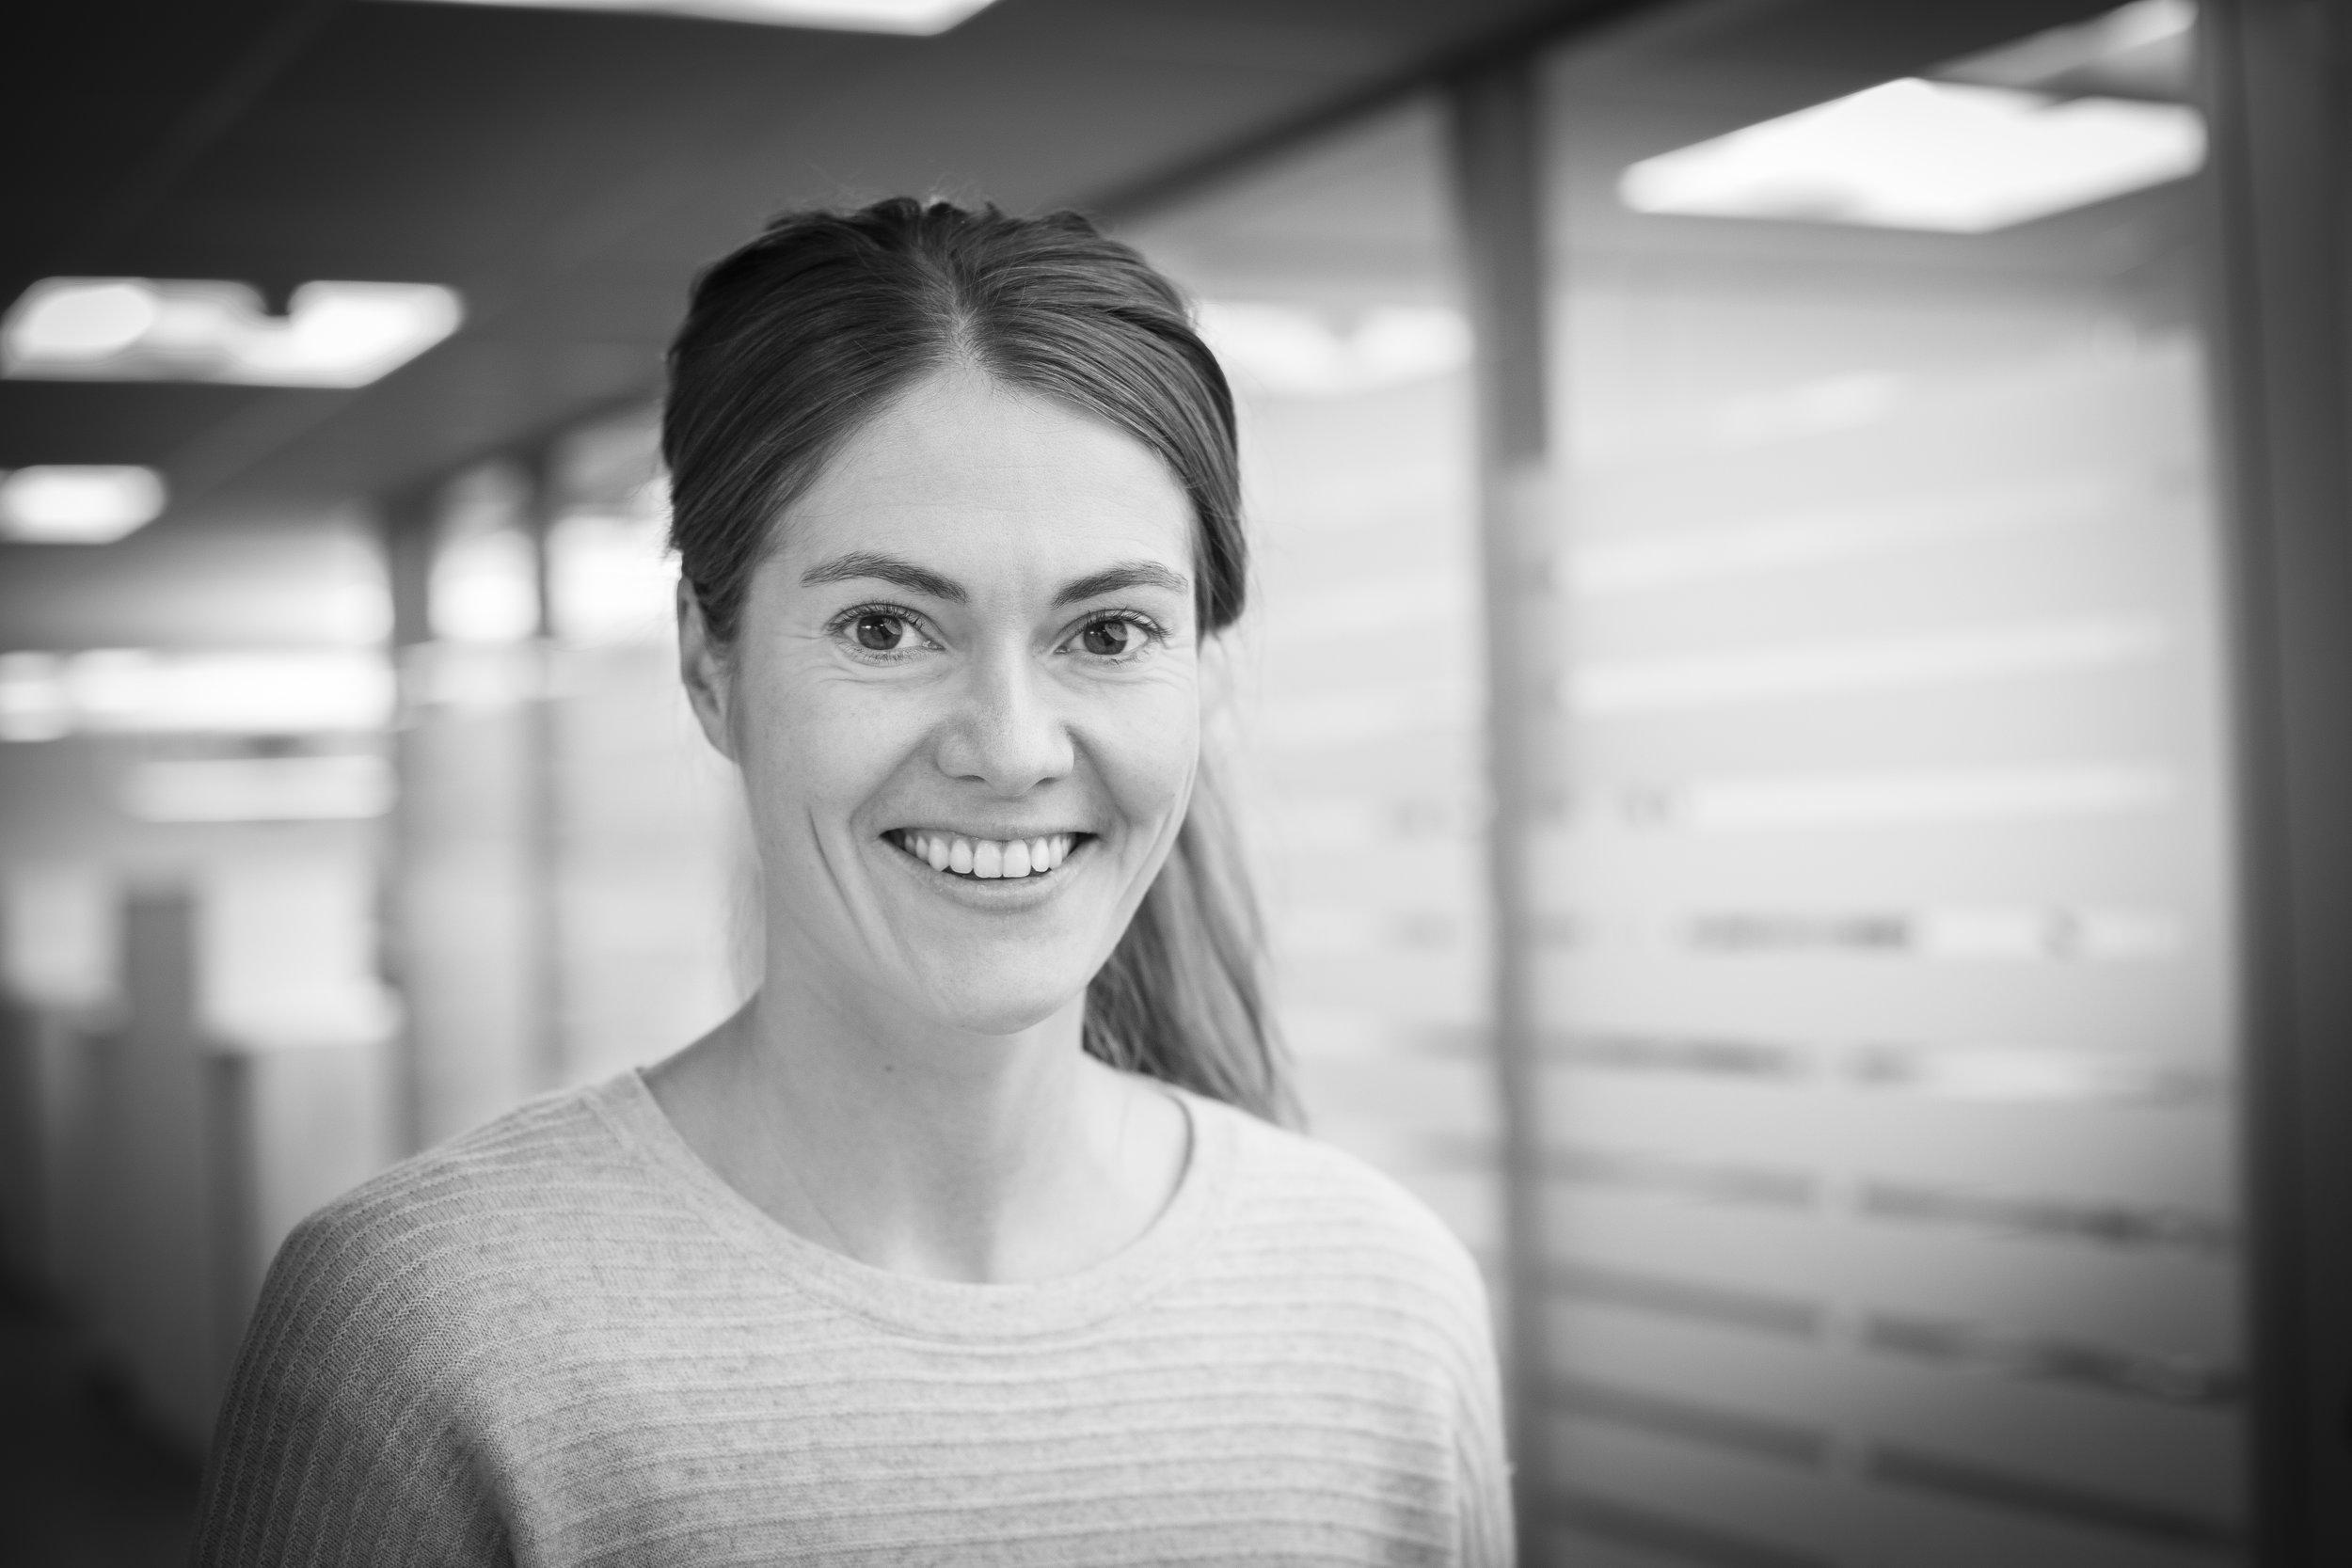 Marianne Algrøy - EnergirådgiverSpesialfelt: Energianalyser og energirådgivning.ma@evotek.no